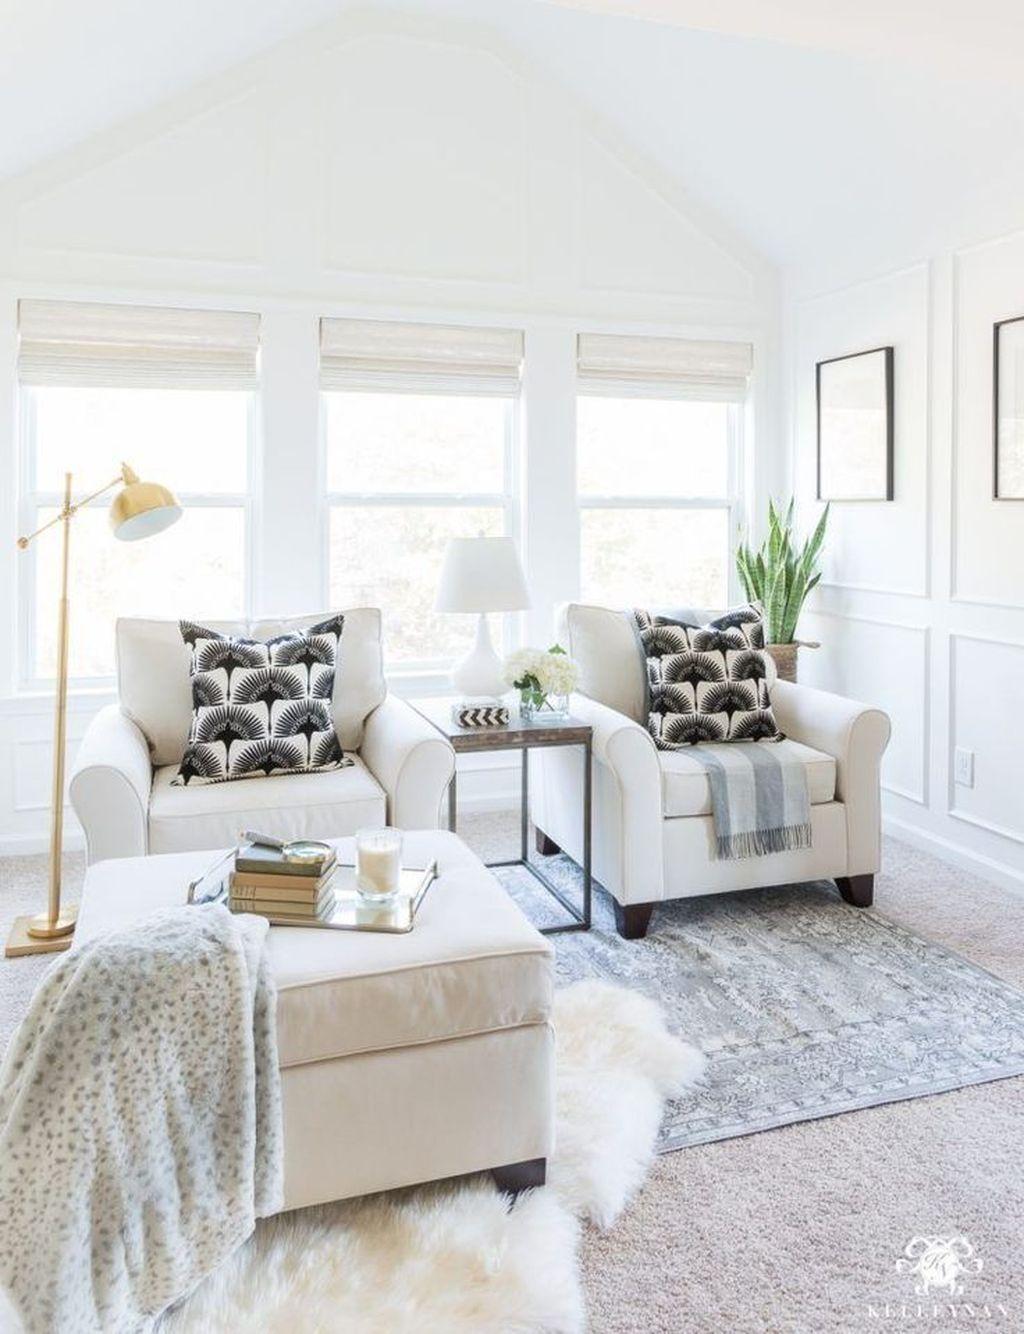 Pin On Transitional Living Room #transitional #living #room #design